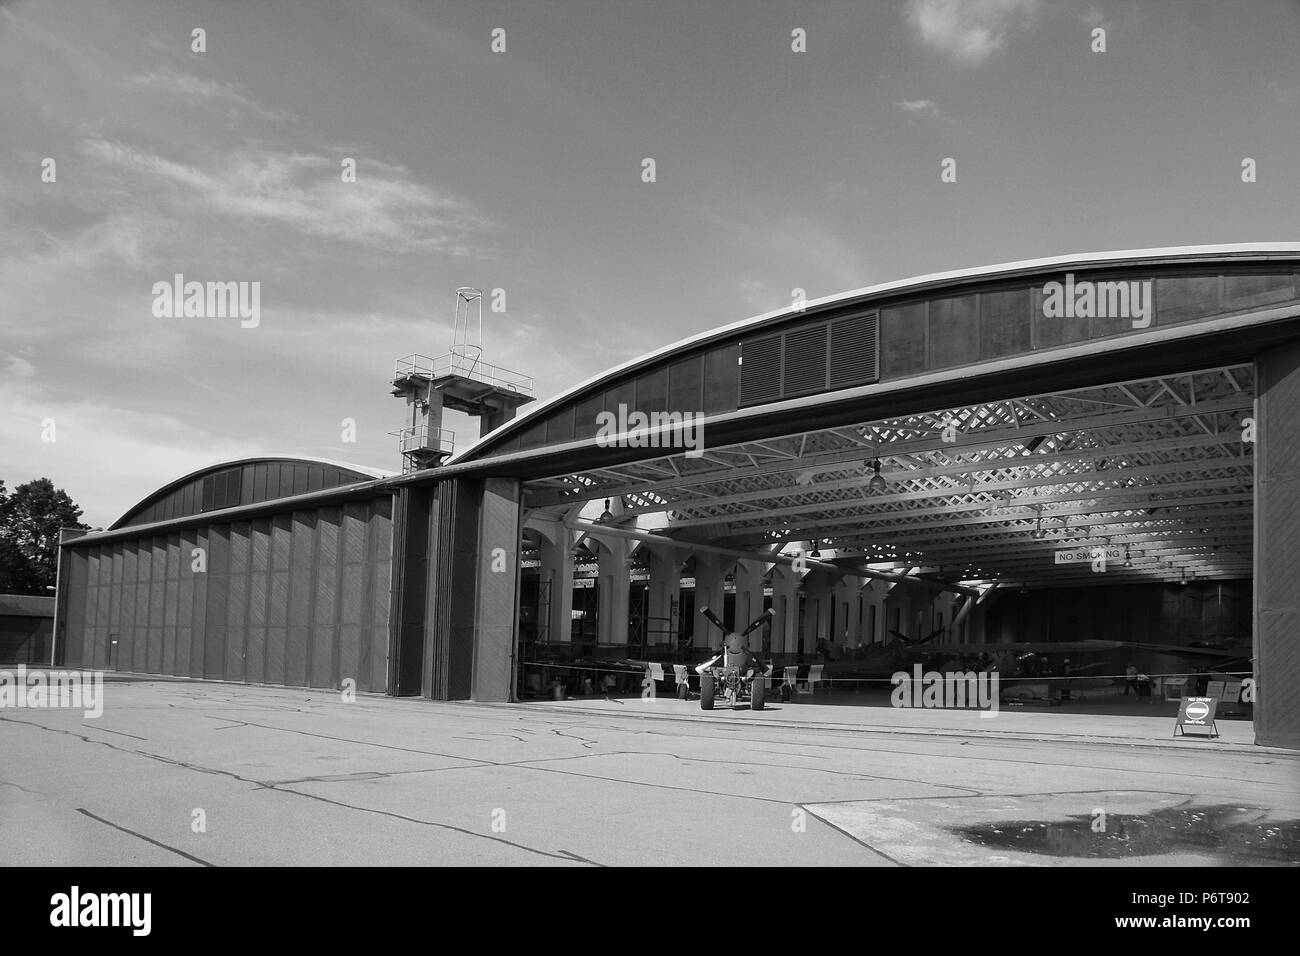 Aircraft Hangar, Imperial War Museum Duxford - Stock Image